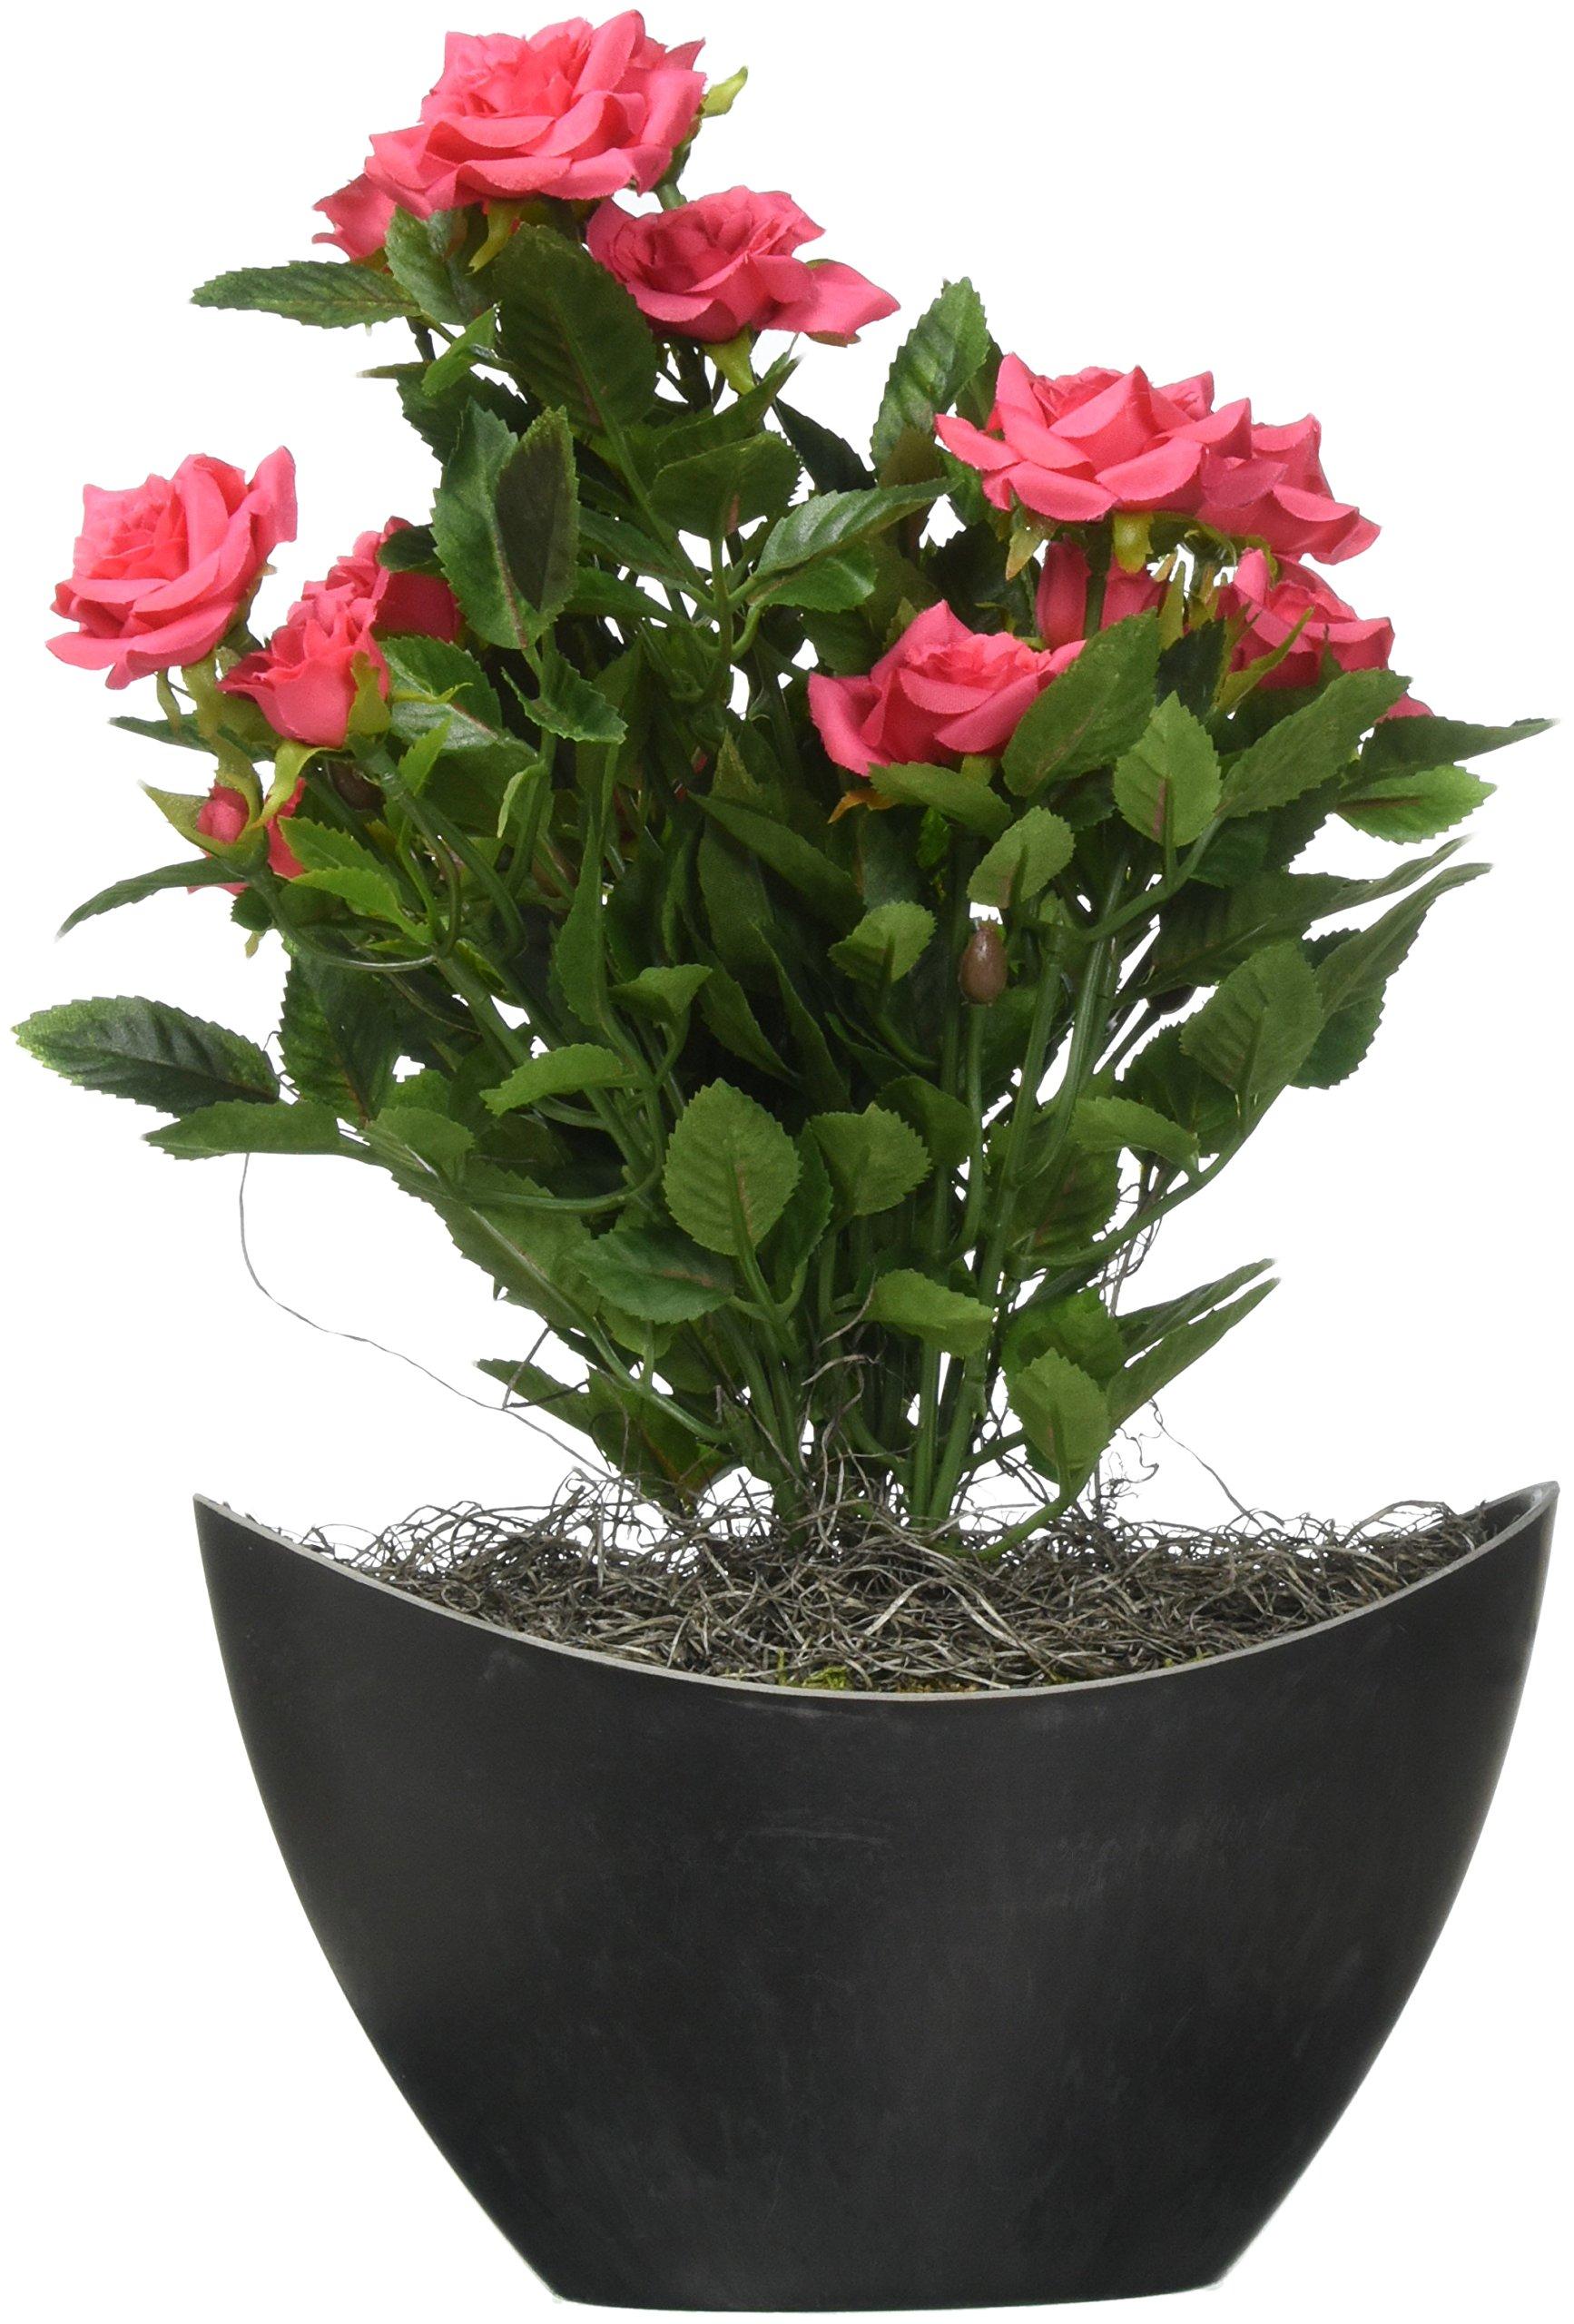 Vickerman F12229 Hot Pink Rose Everyday Floral